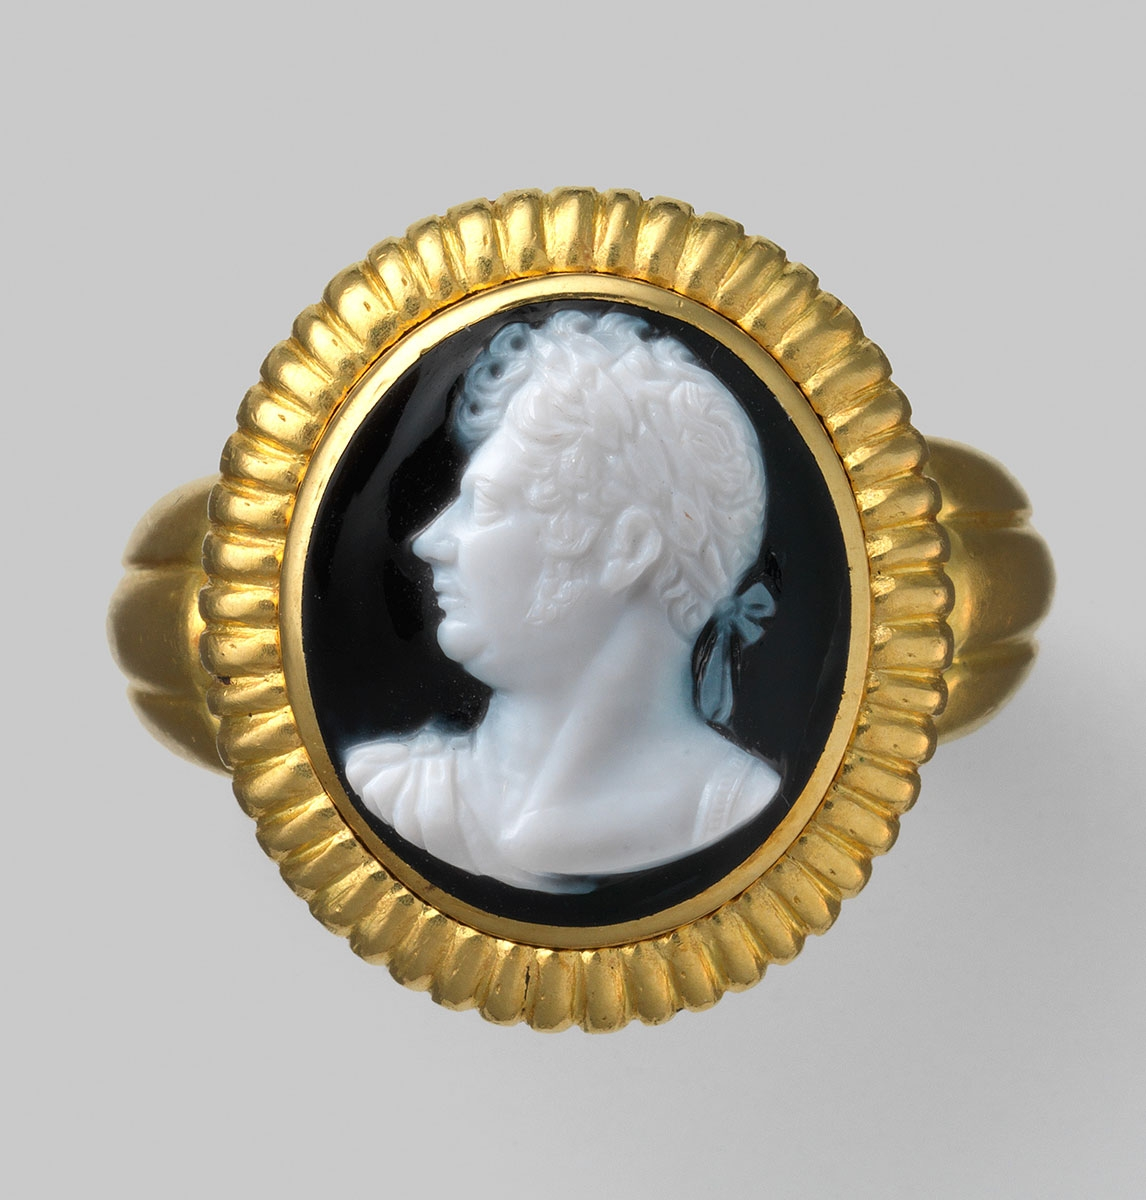 Goldring mit Onyx-Kamee, Bildnis Georg IV. (1762-1830), um 1821